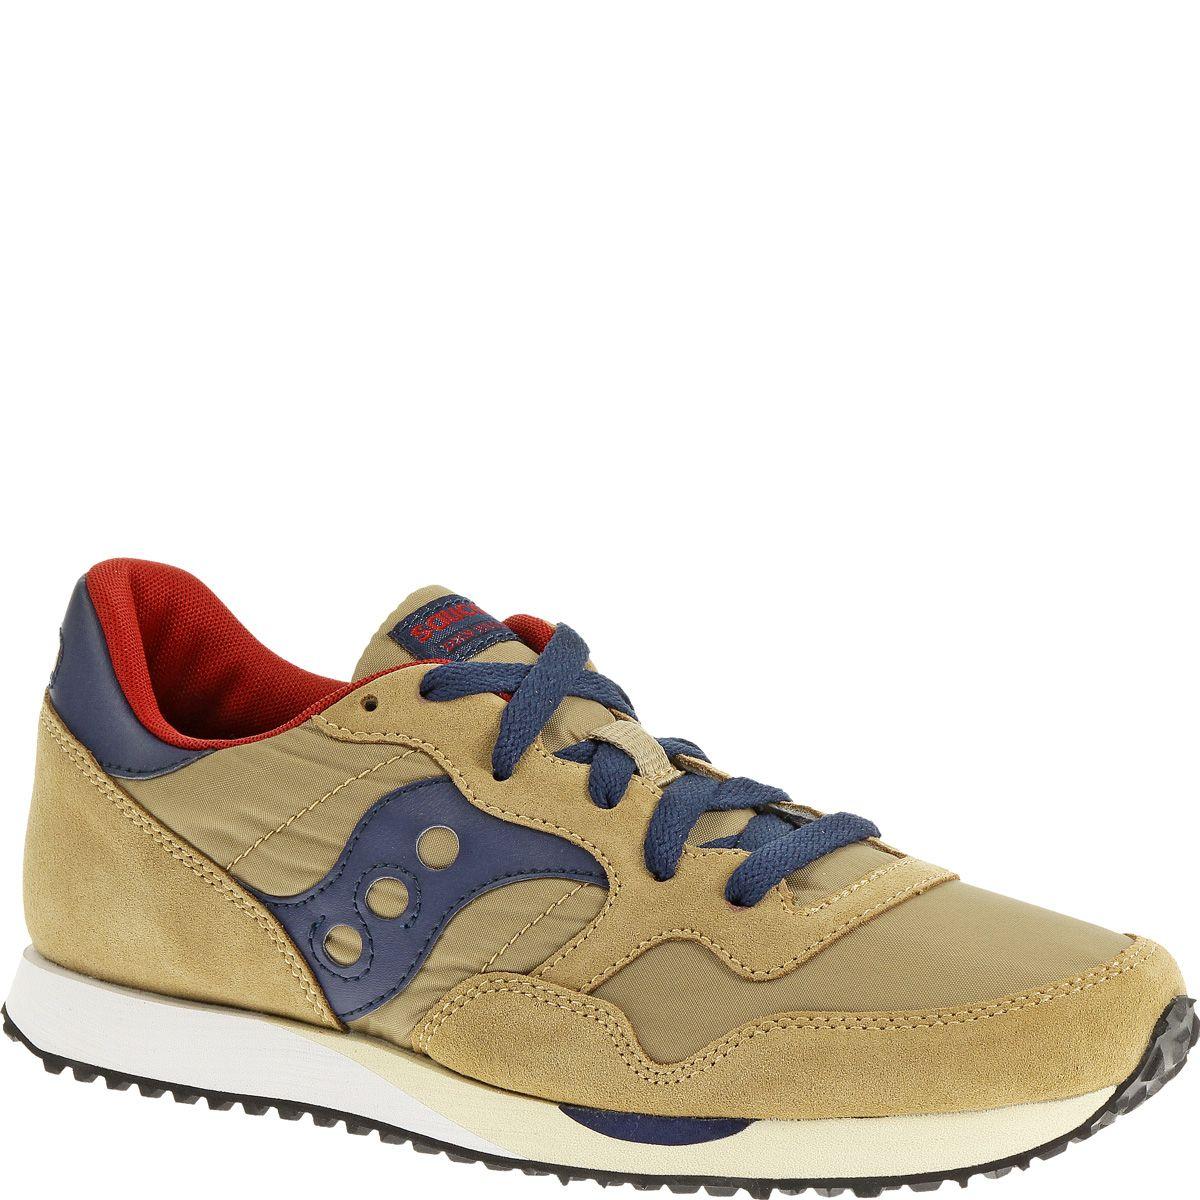 Мужские кроссовки Saucony DXN Trainer бежевые с темно-синим